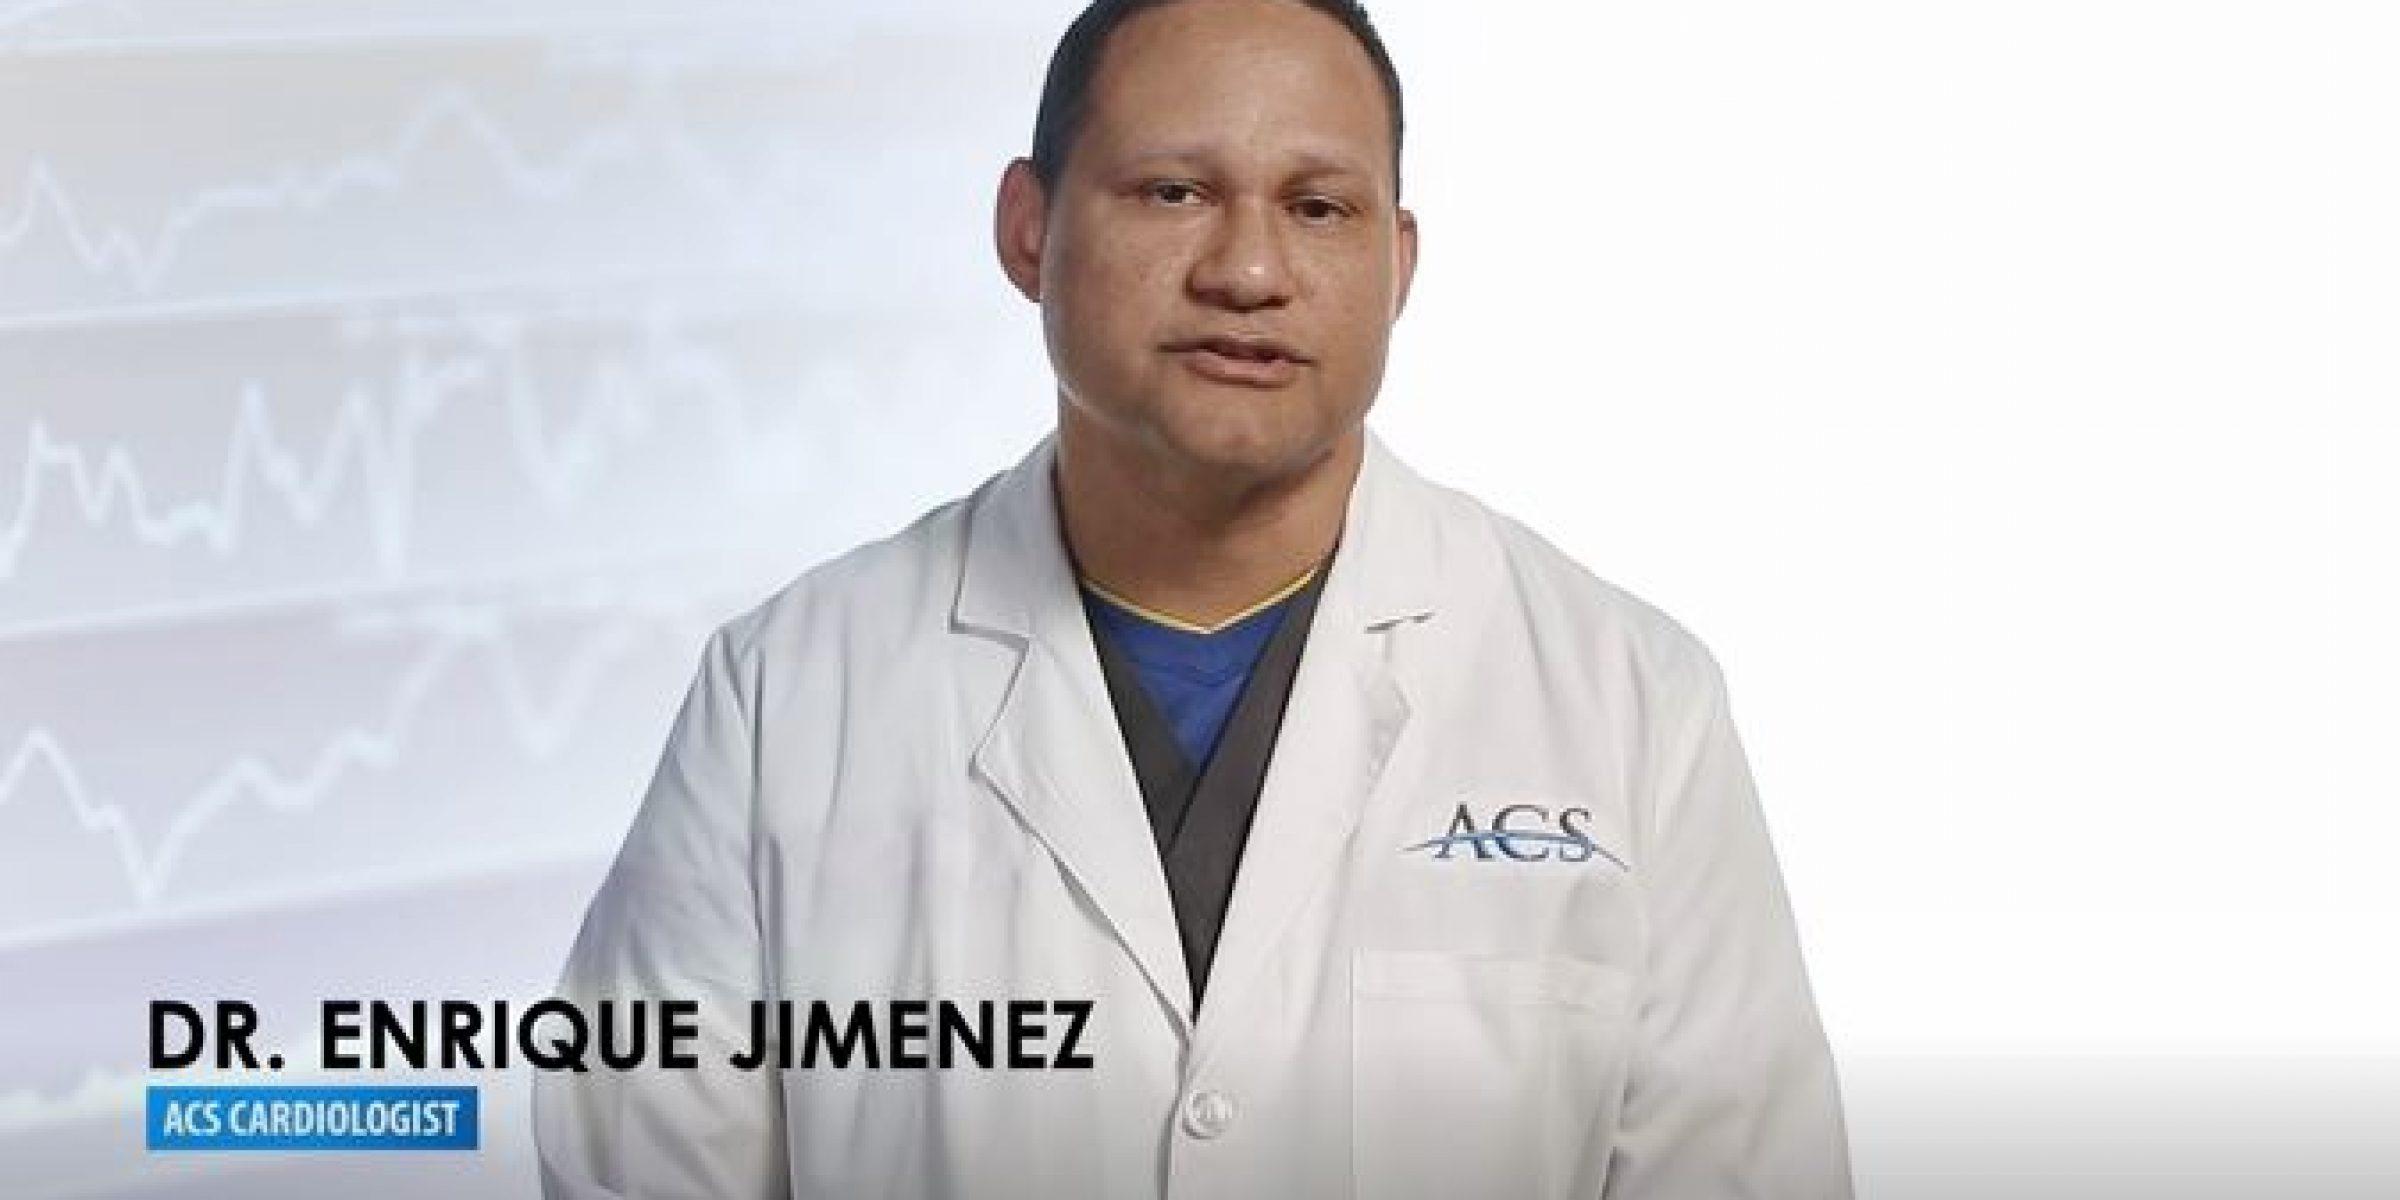 Cardiologist, Shreveport Cardiologist, Advanced Cardiovascular Specialists, Varicose Veins